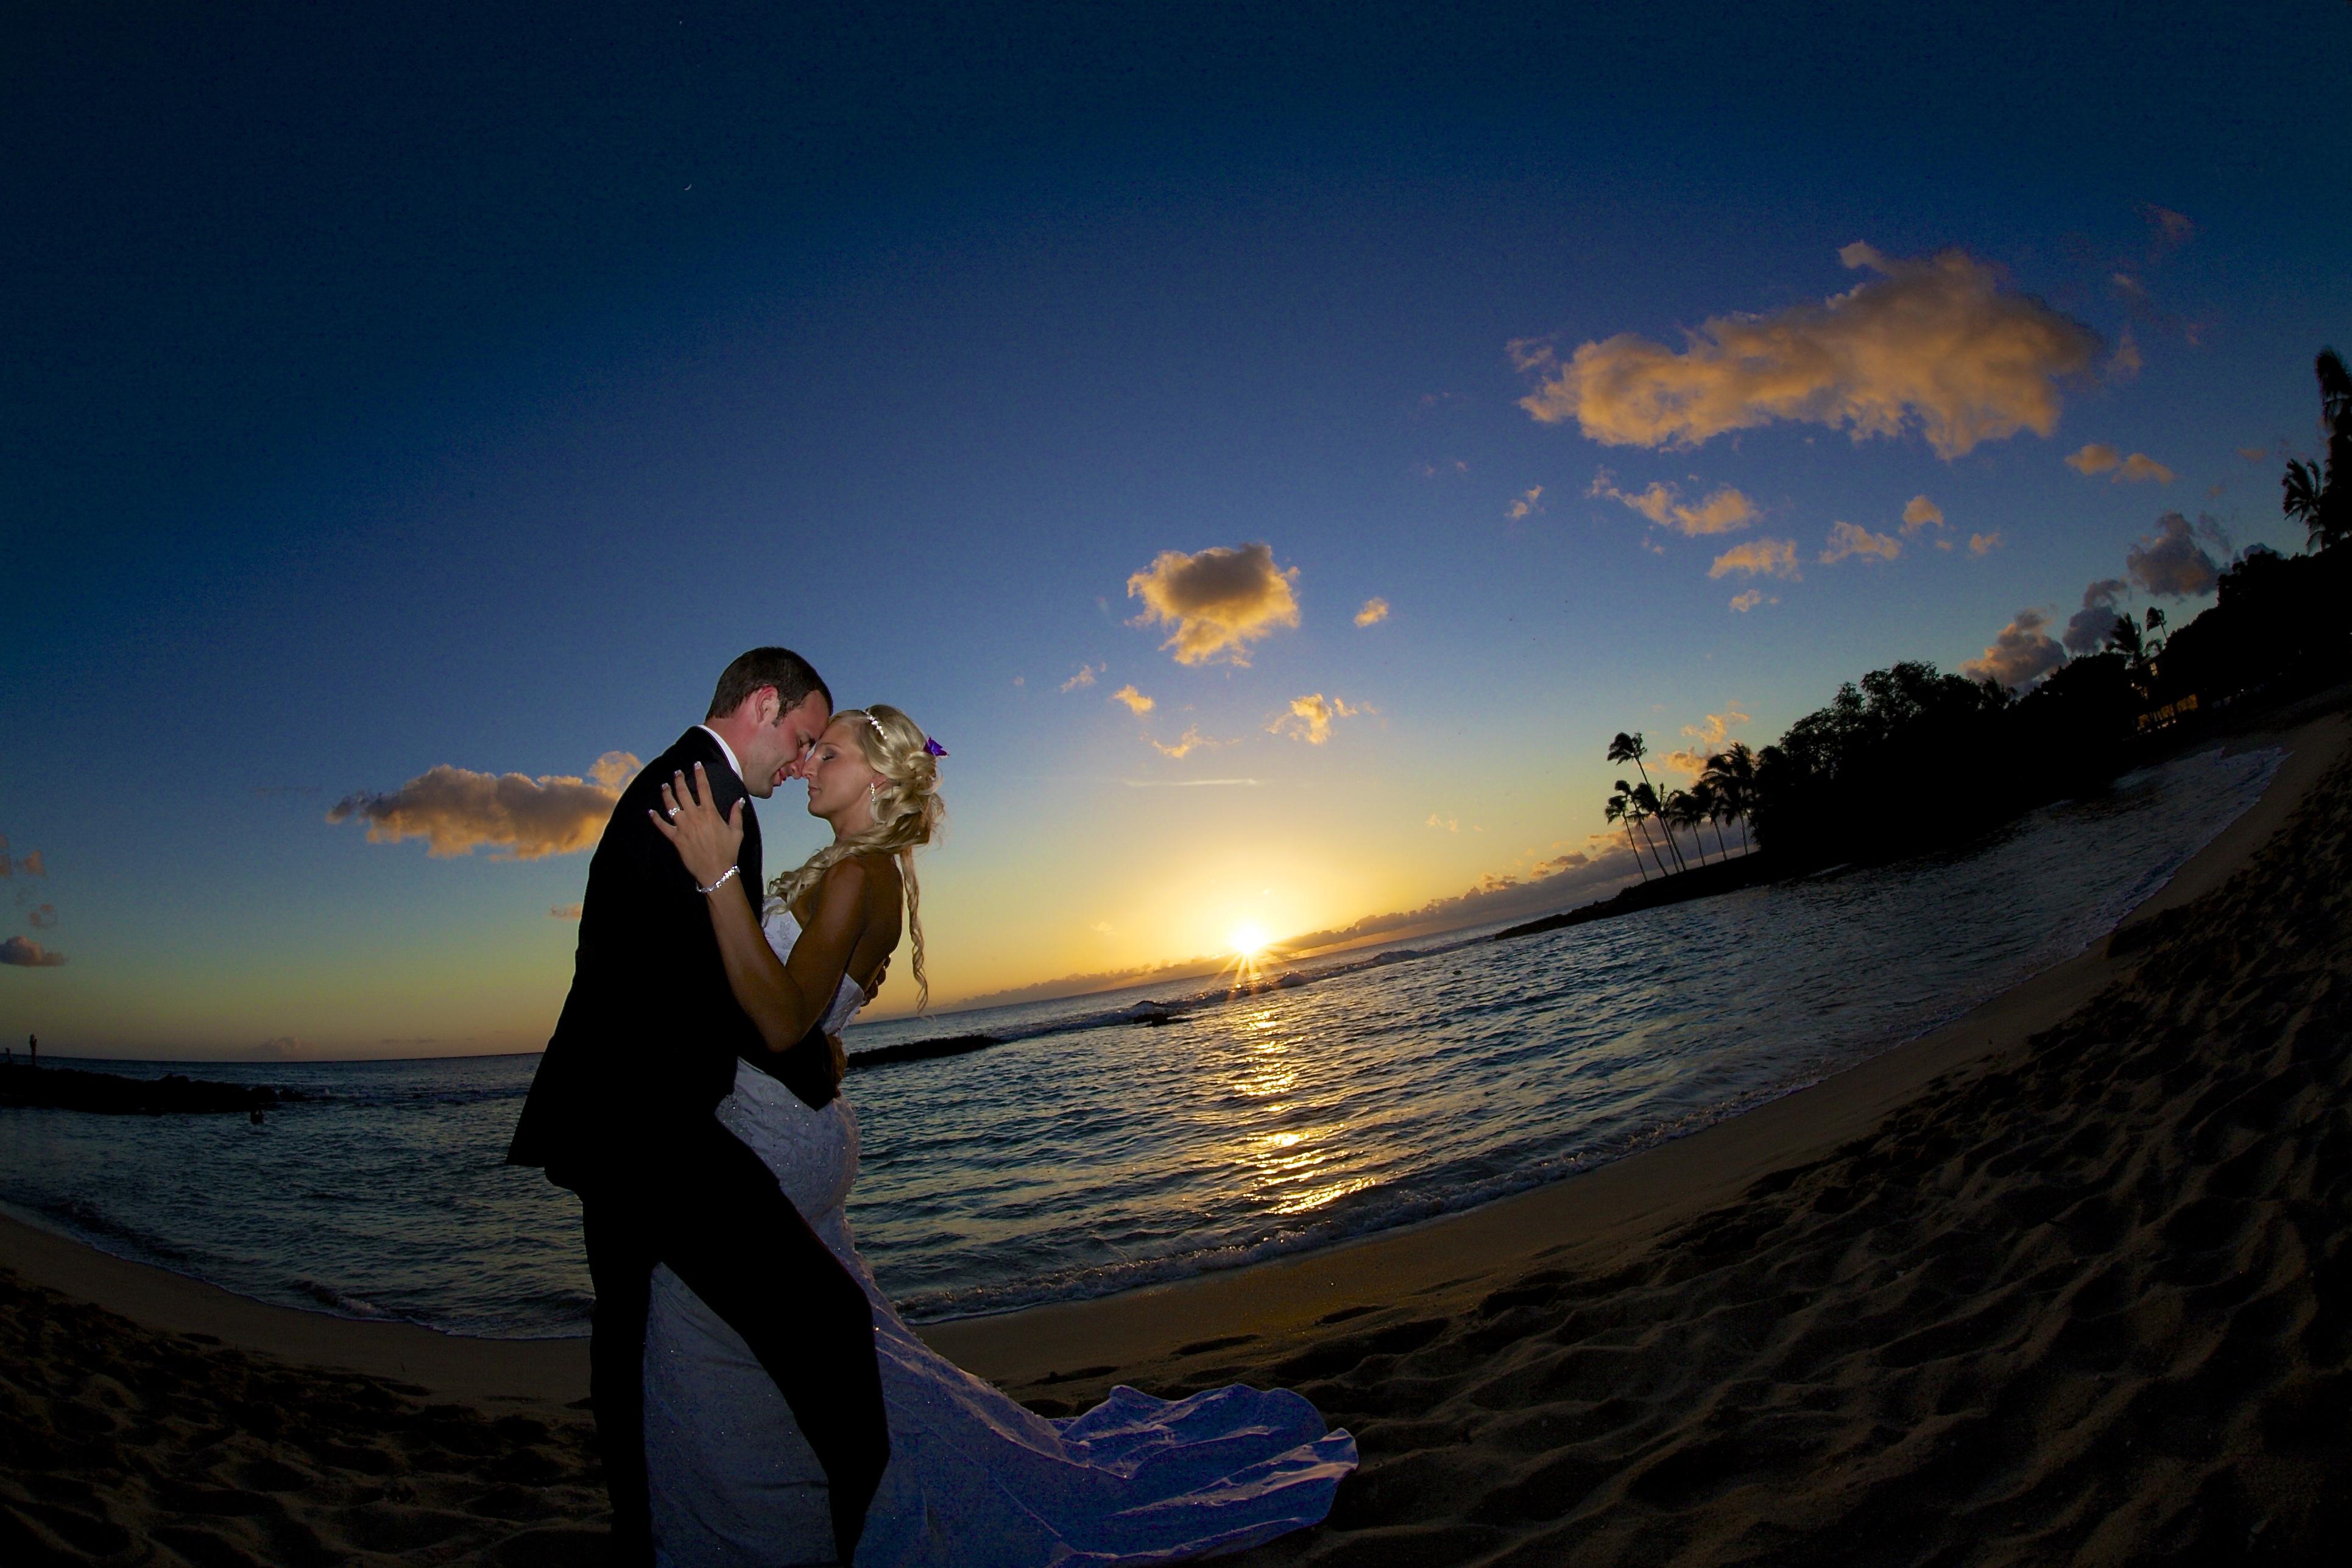 Sunset wedding photos in Hawaii 8